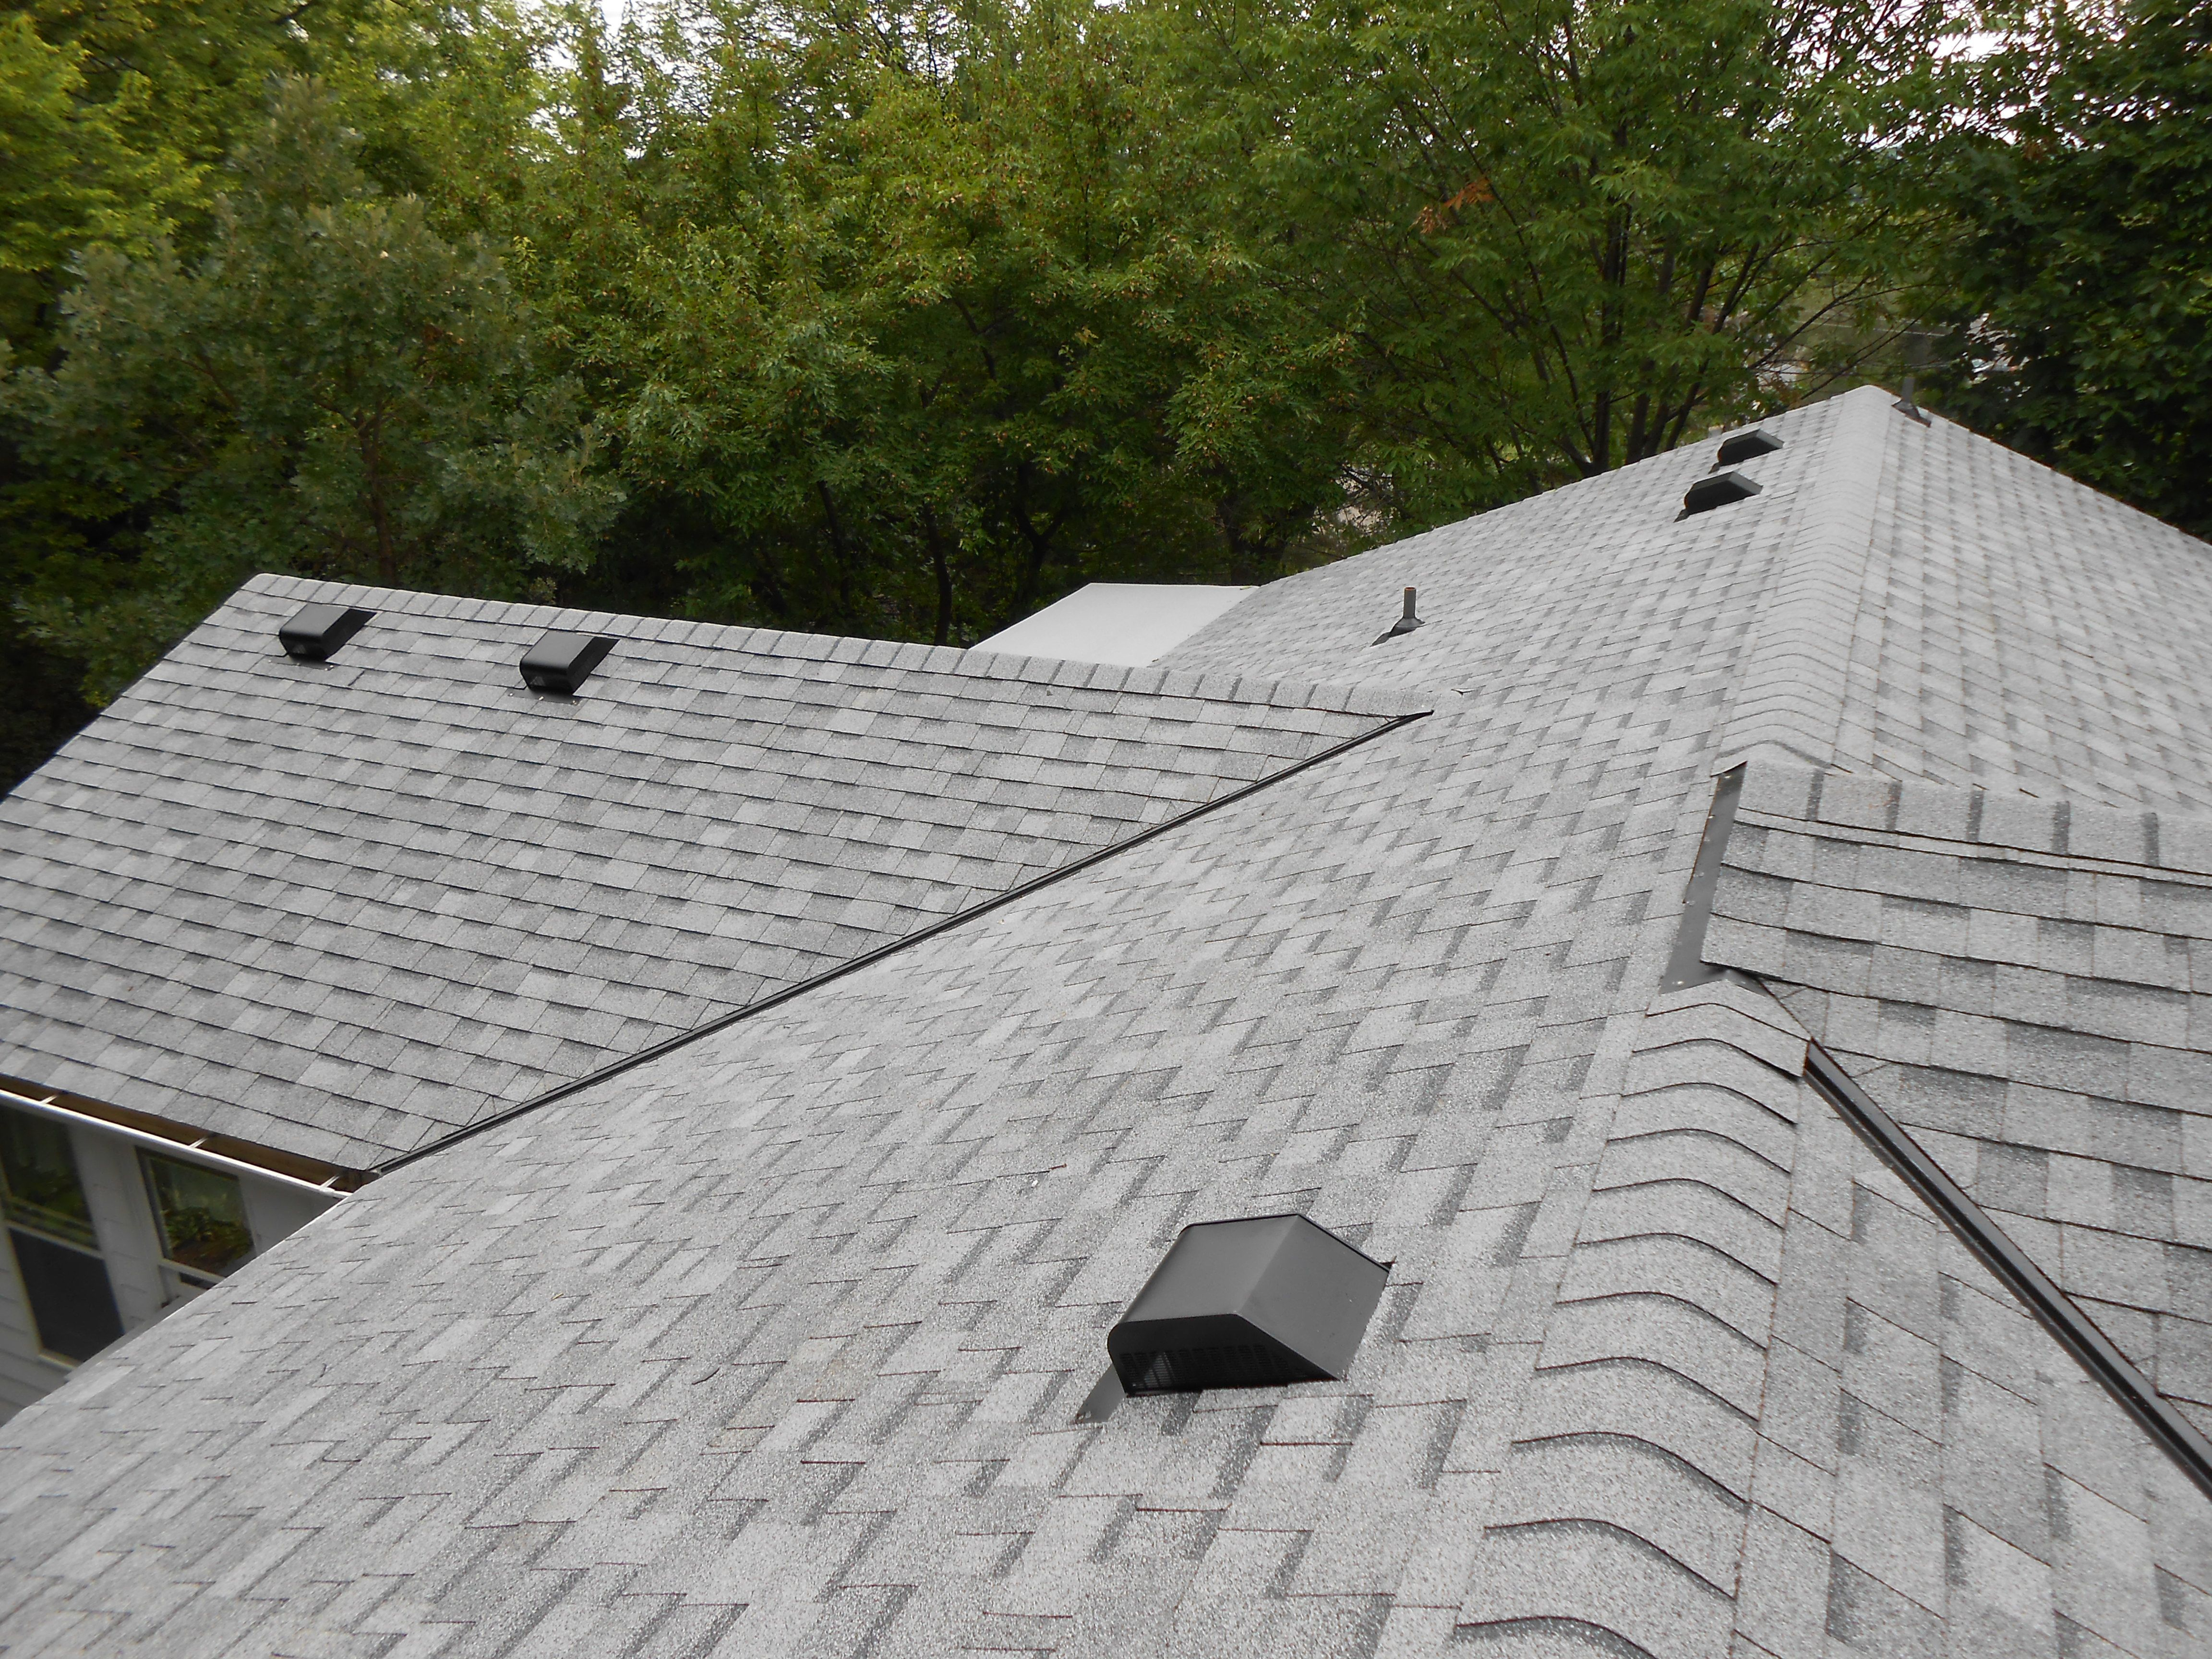 Owens Coring Shingles White Shingles Gray Shingles Black Roof Accessories Asphalt Shingles Roofing Roo Roof Cost Metal Roofing Materials Asphalt Shingles